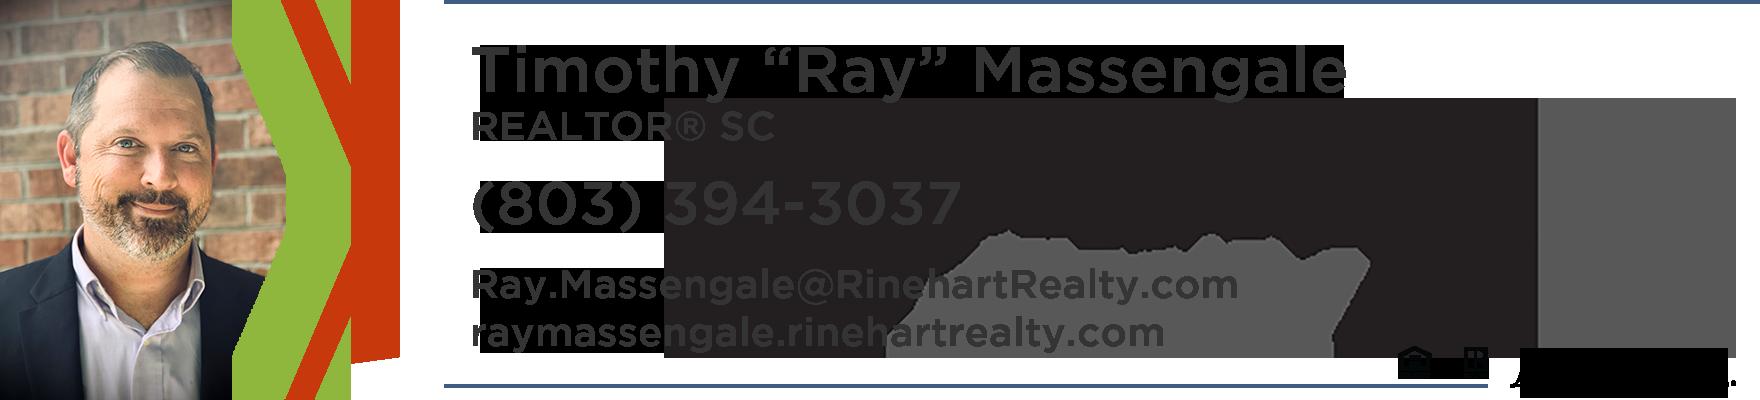 Ray Massengale REALTOR SC